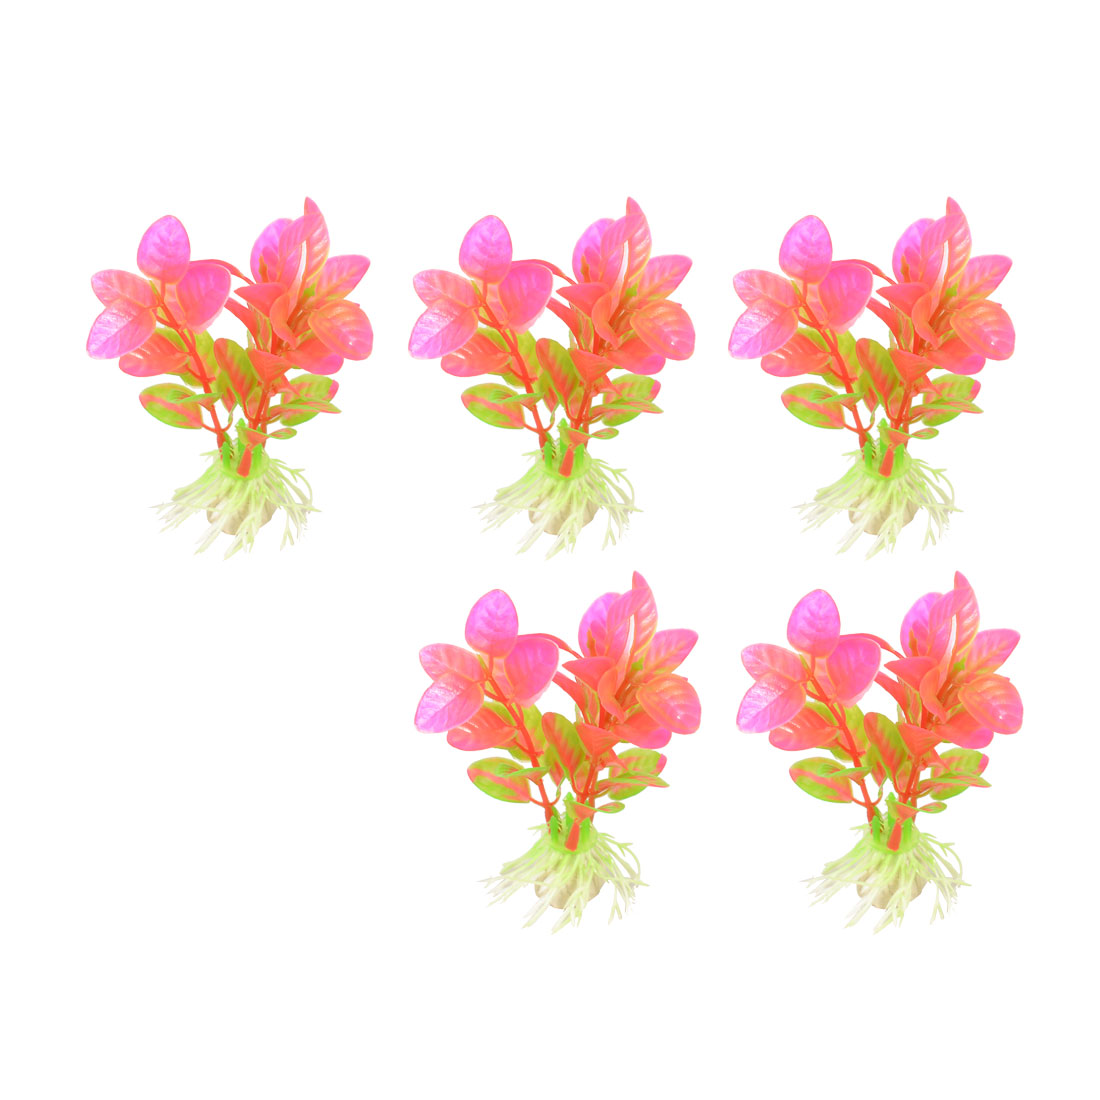 "5 Pcs Fish Tank Decor Plastic Green Pink Plant 4.1"" Height"